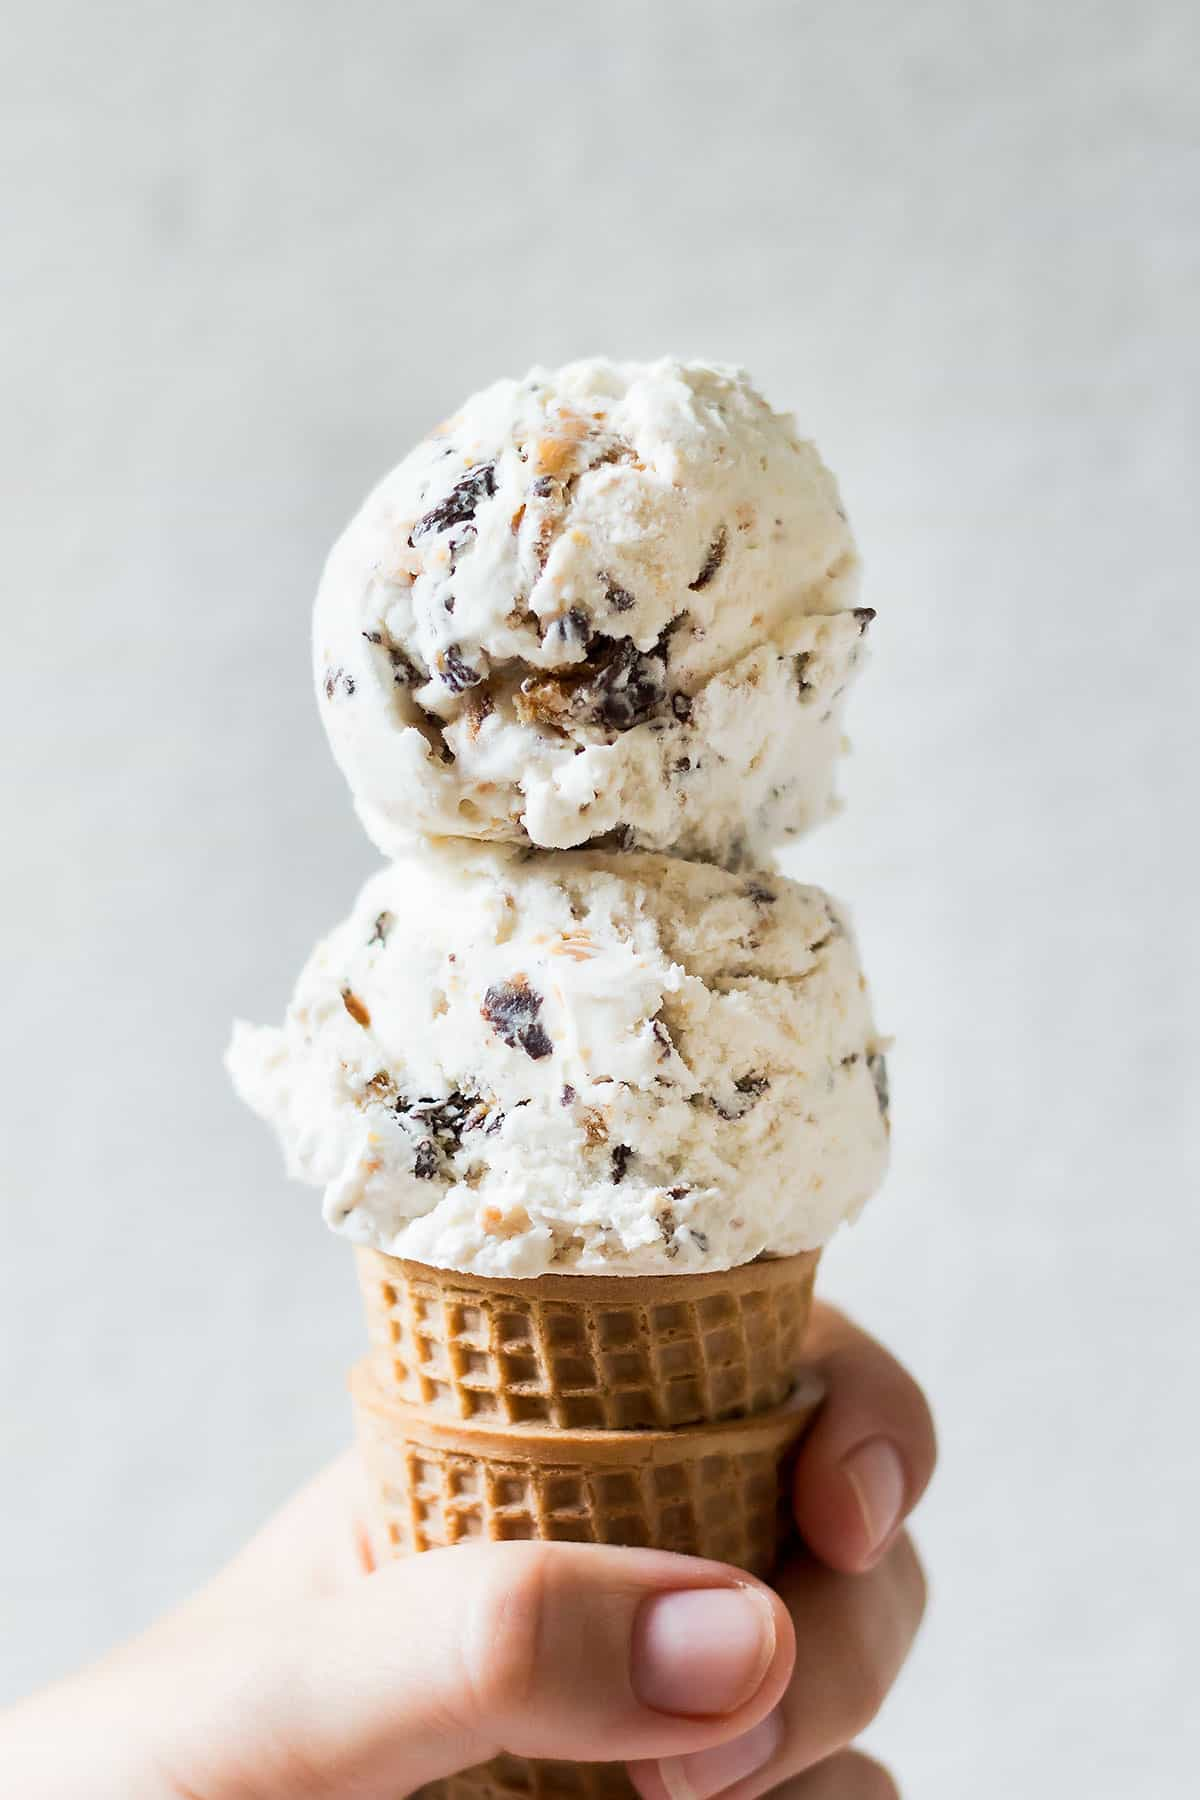 Holding Ice Cream Cone